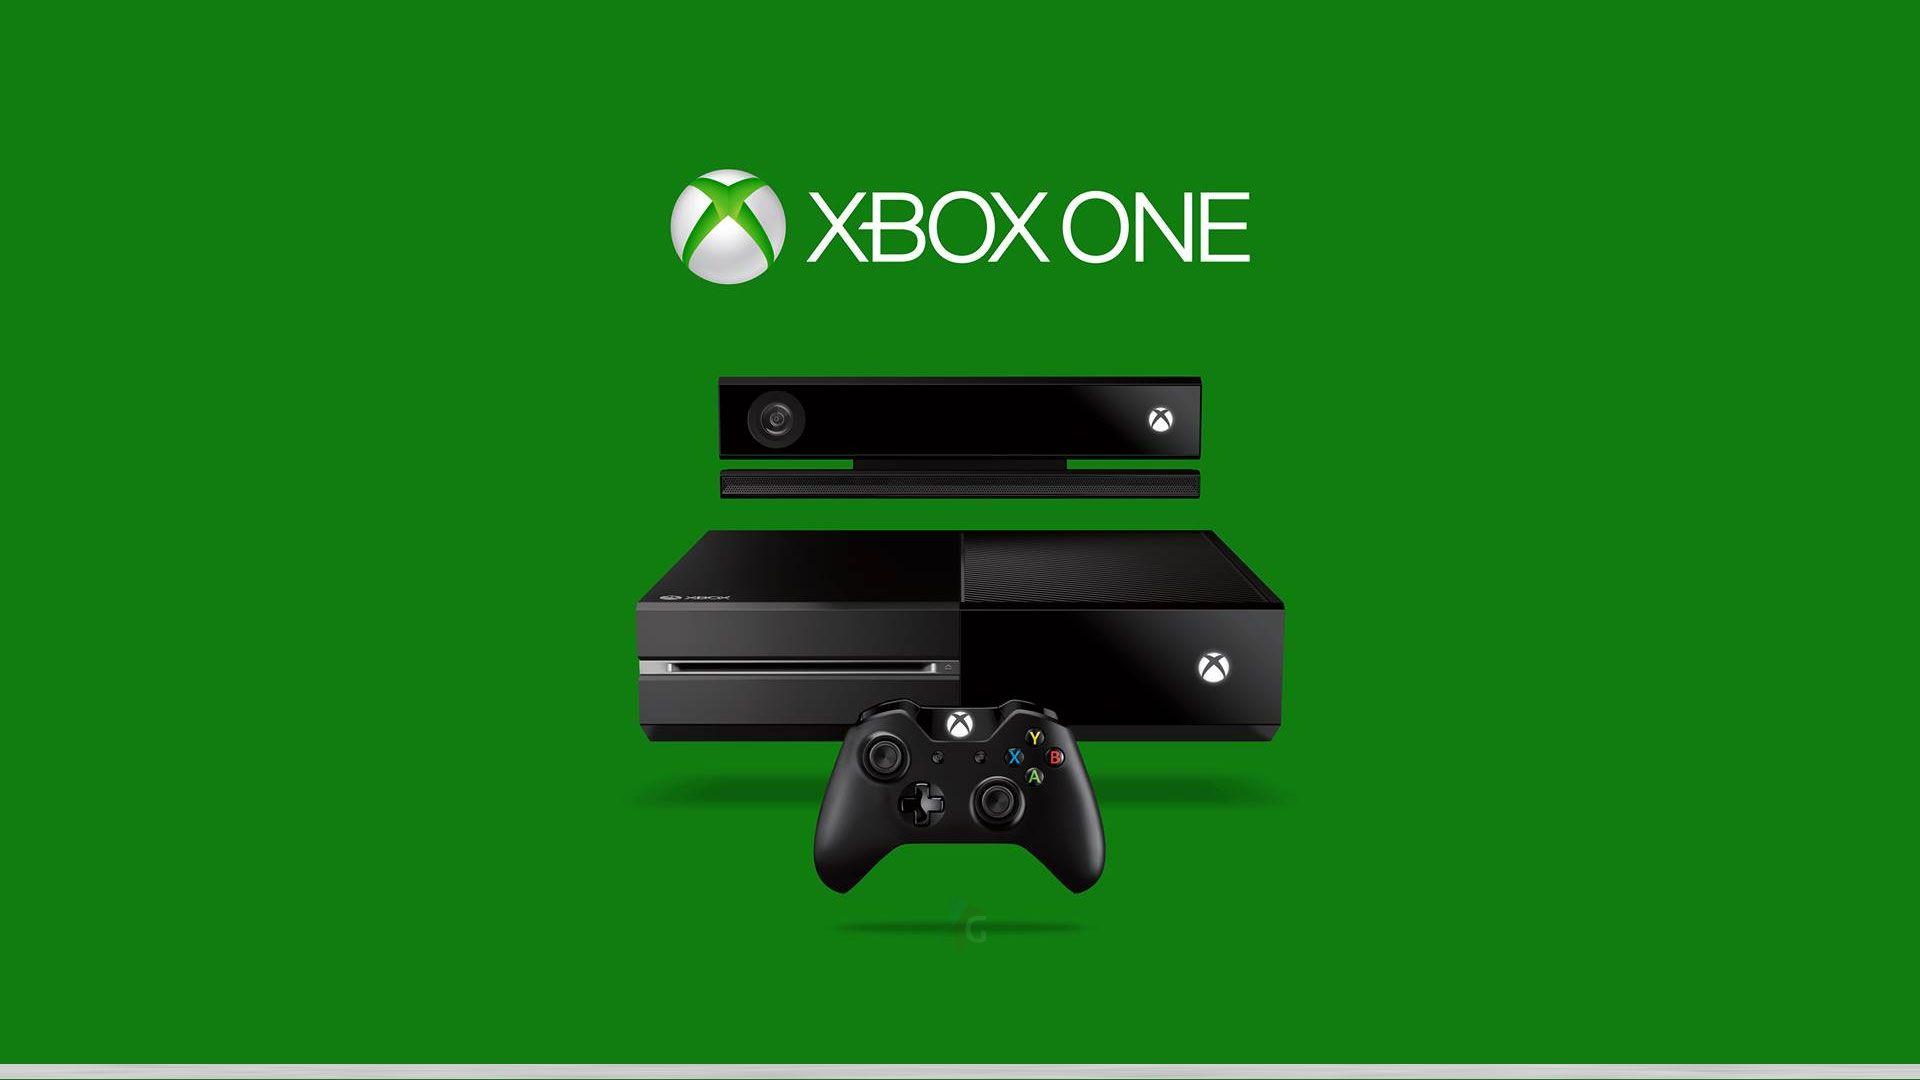 Xbox One Wallpaper 1080p Xbox One Xbox Xbox One Games